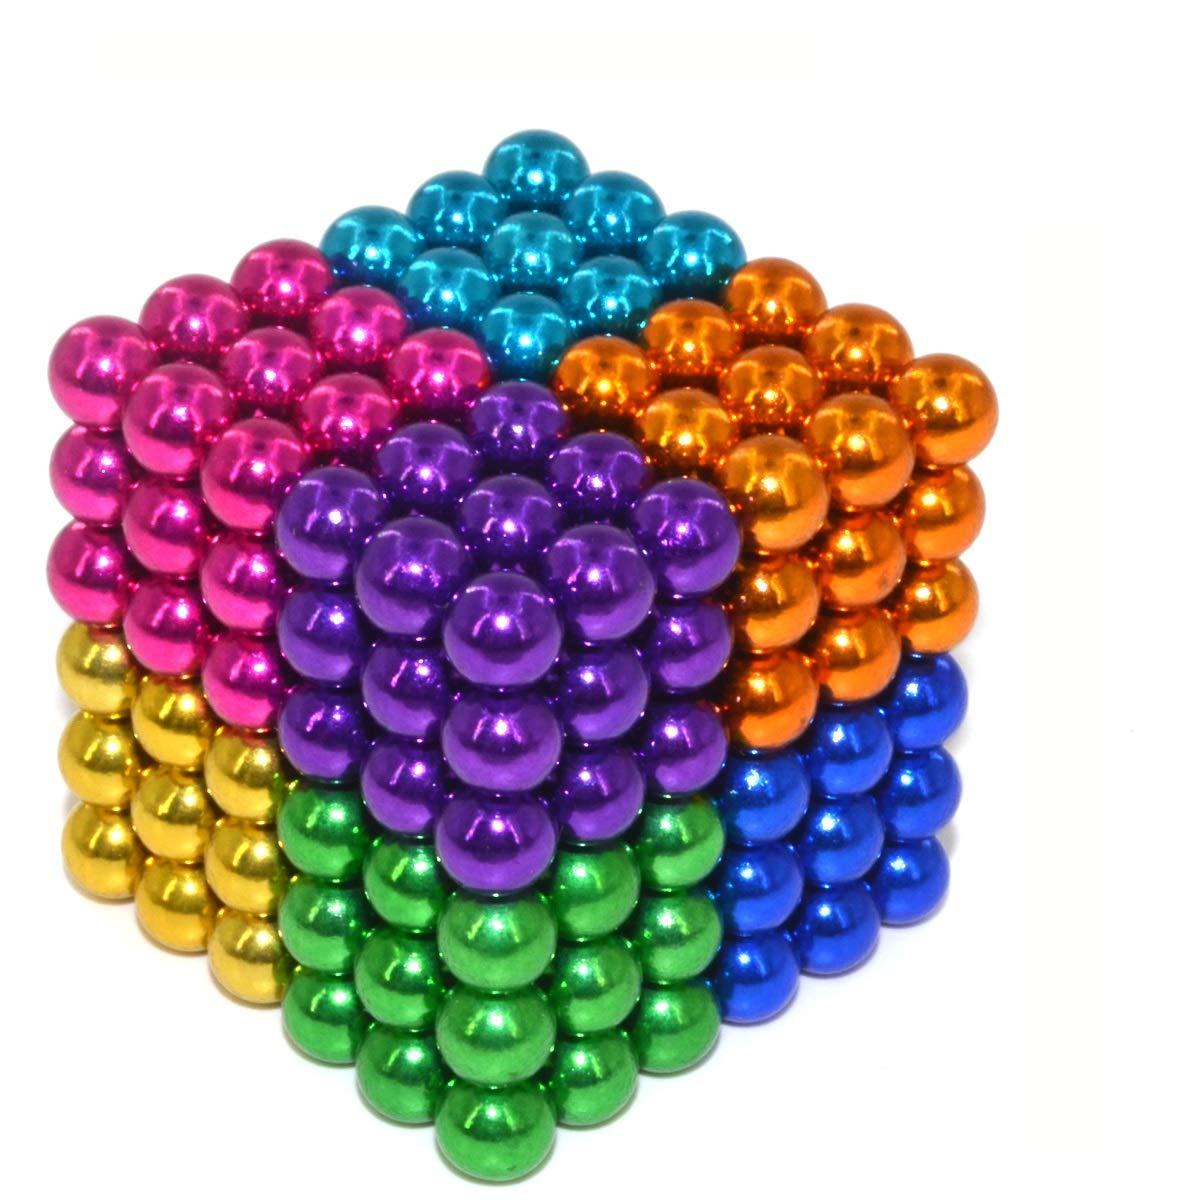 Puzzle 3D de Bolas Magneticas de Neodimio